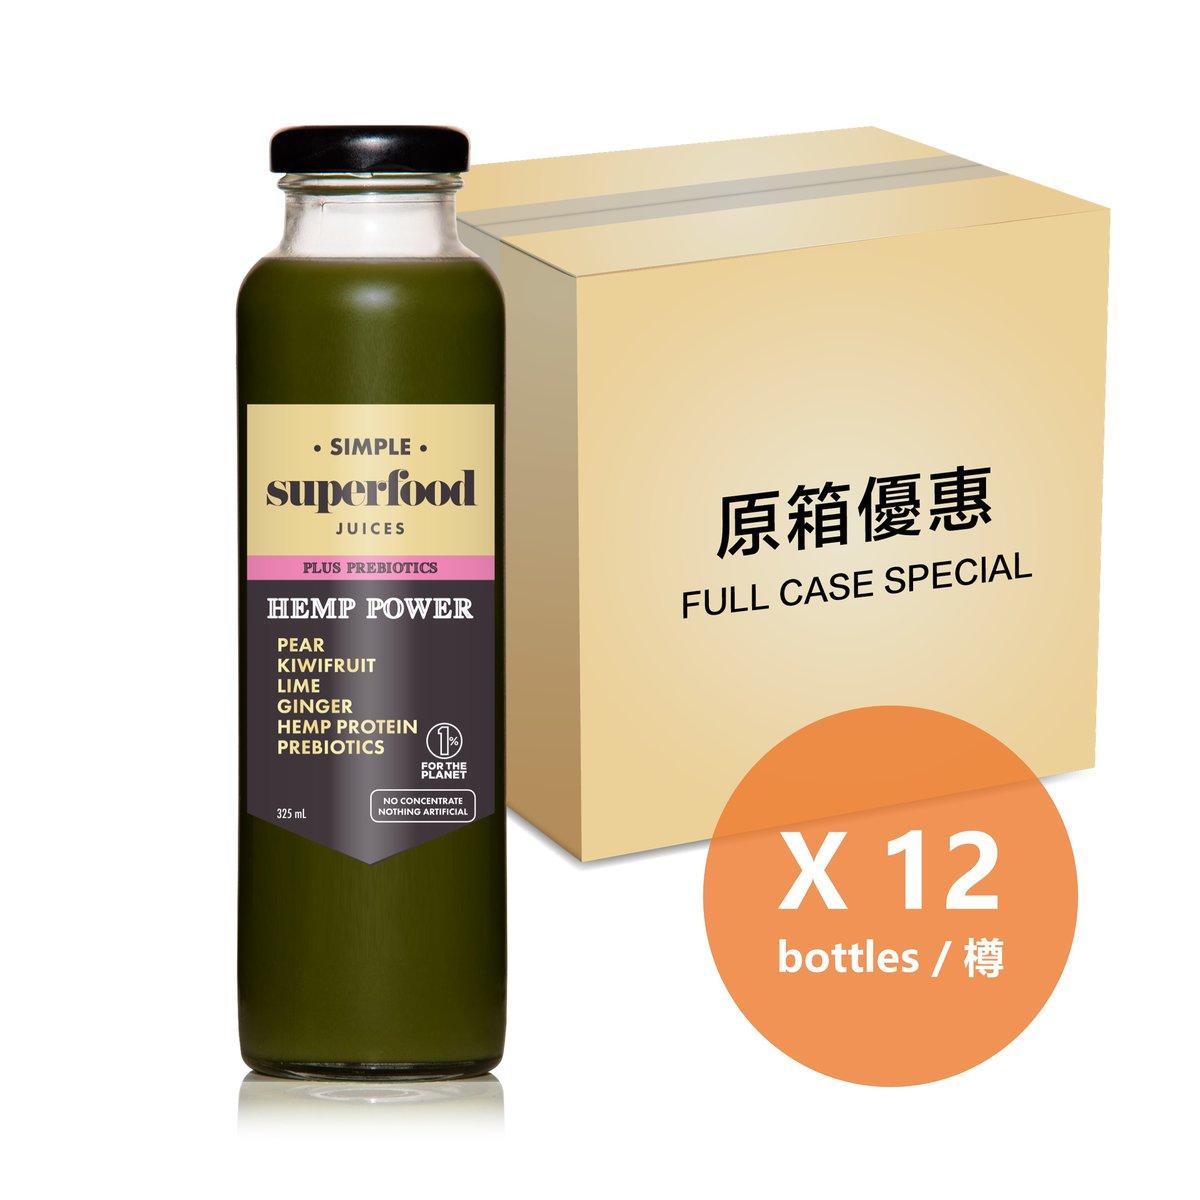 [Full Case] Hemp Power Prebiotic Smoothie - 325ml Bottle